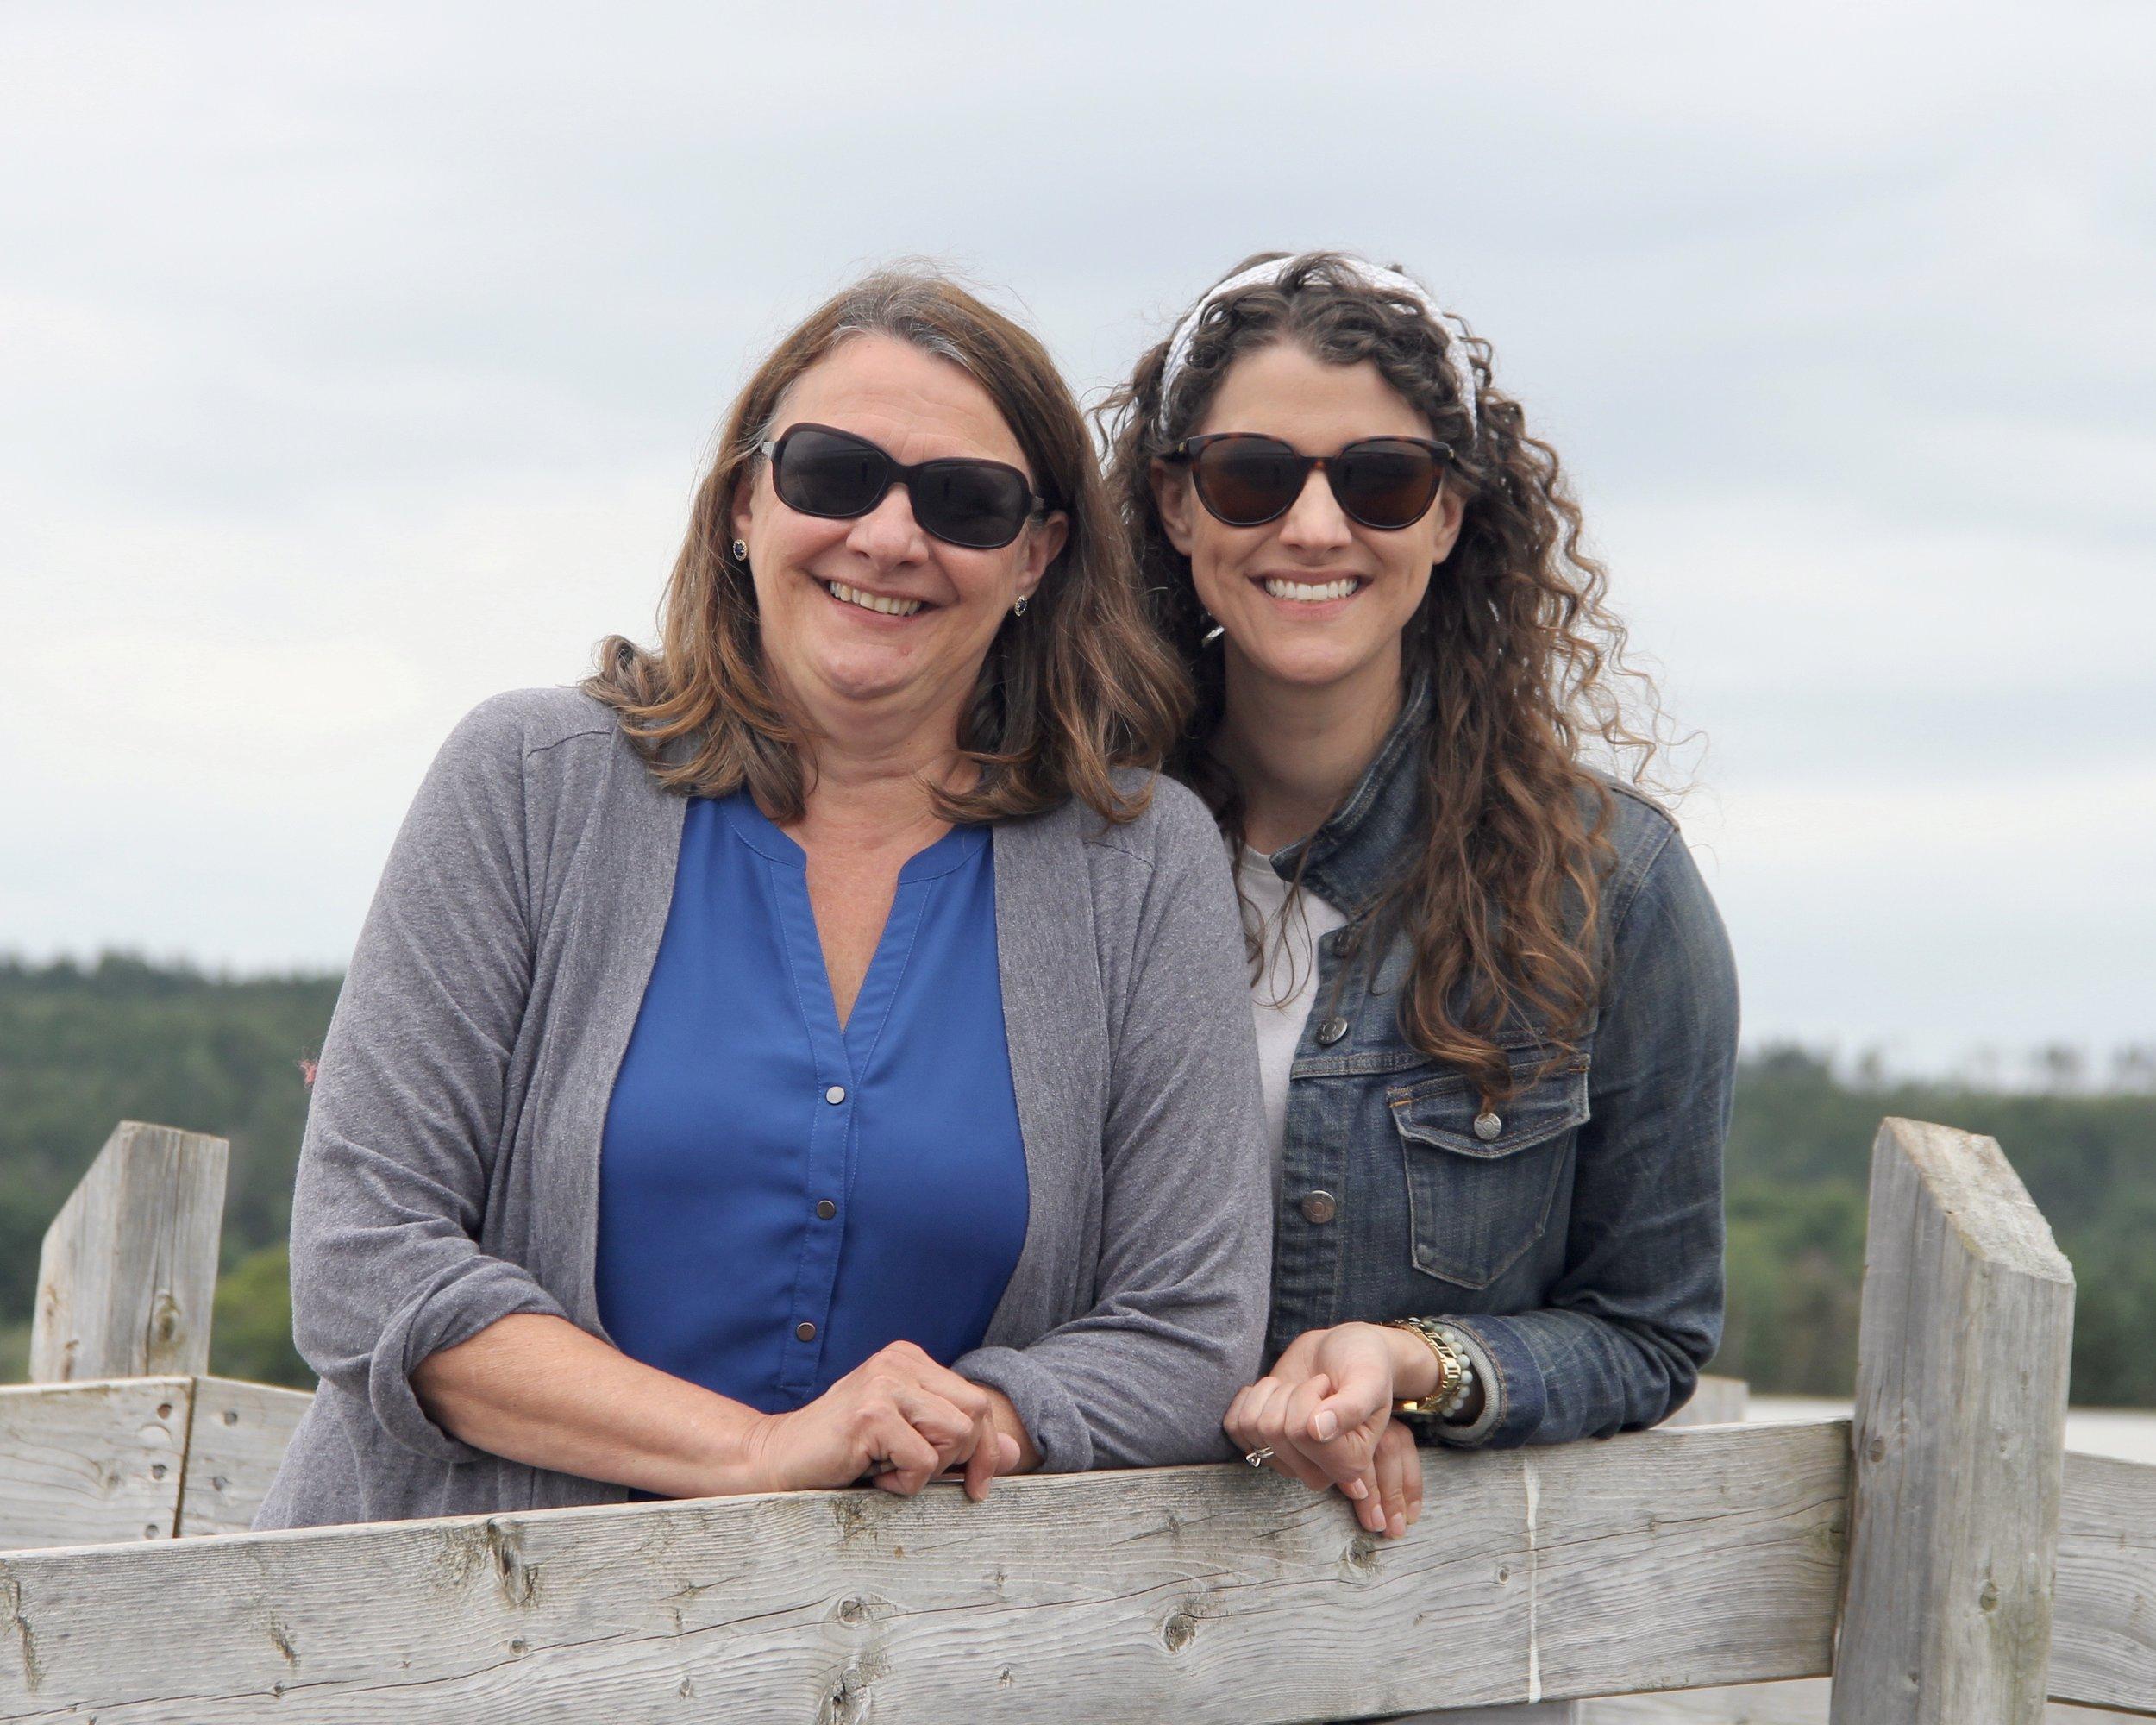 Anita and Alison at Scot's Bay, Nova Scotia